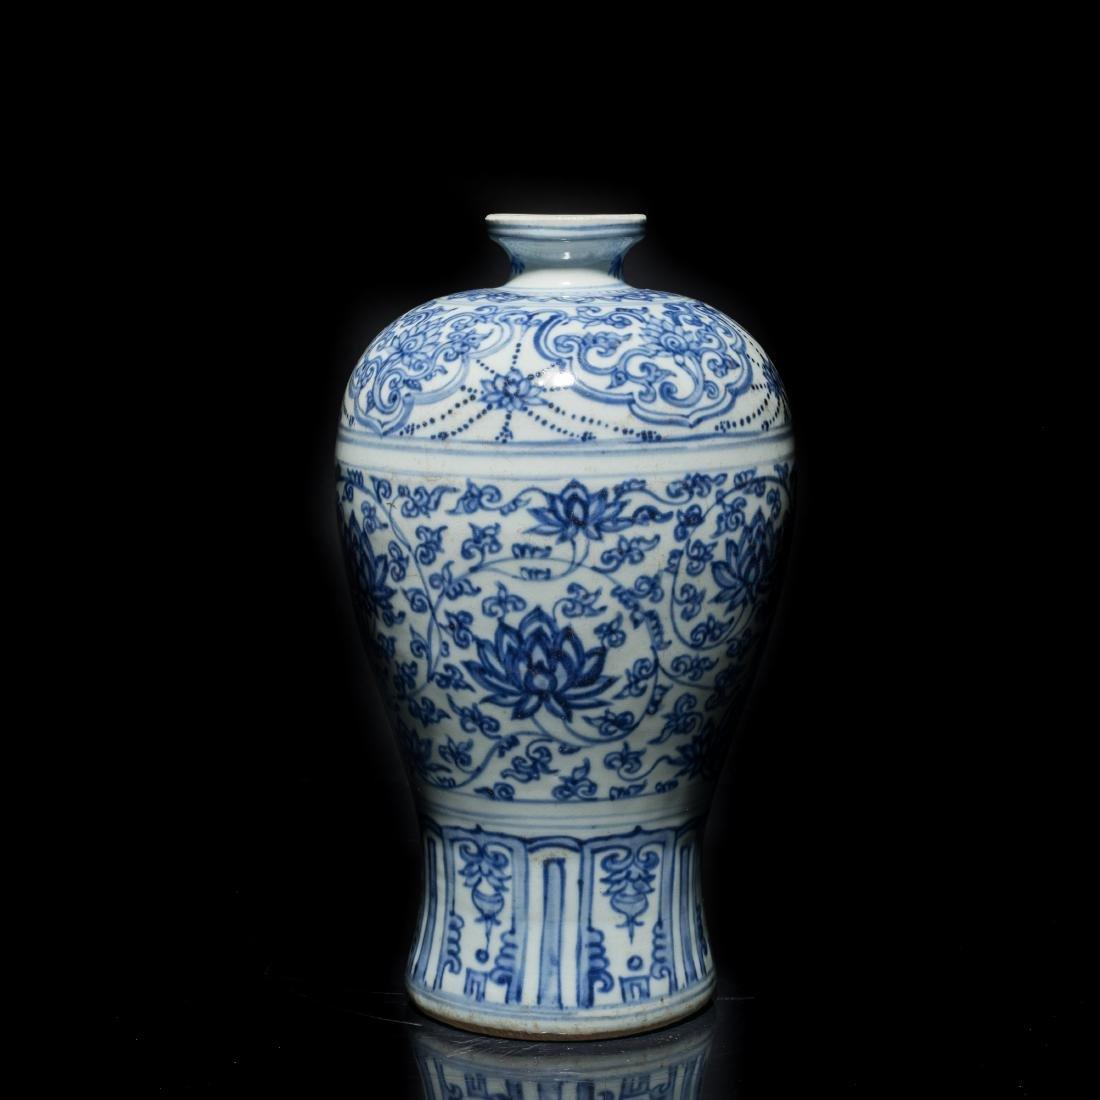 Ming Antique Blue and White Porcelain Vase